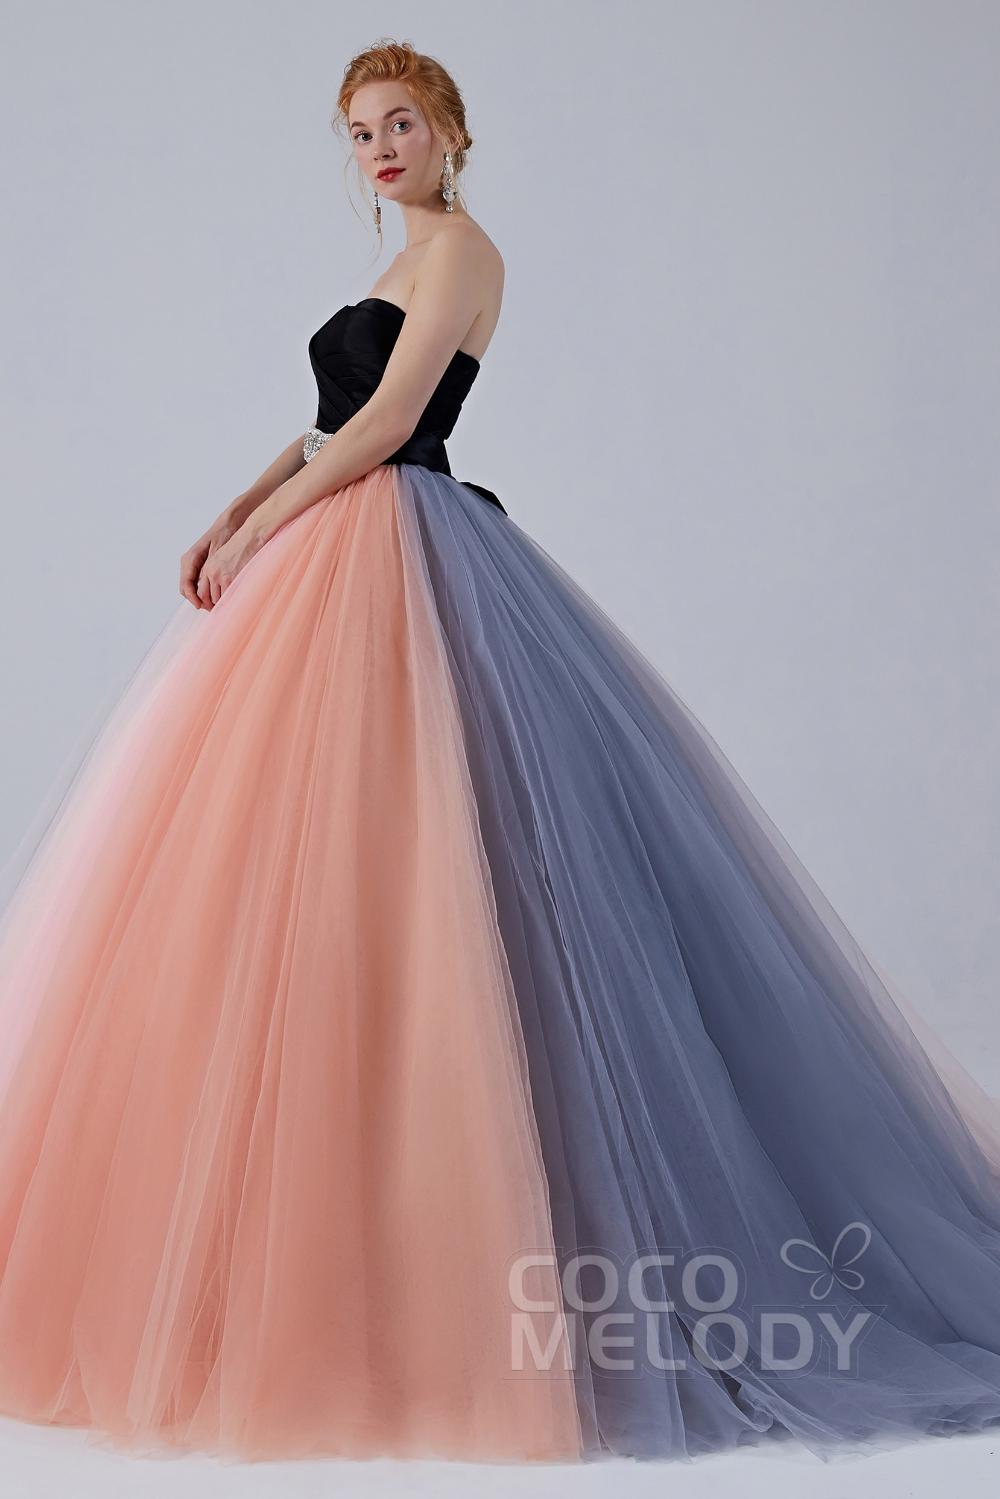 [ USD 899 ] Lovely Tulle Sleeveless Lace UpCorset